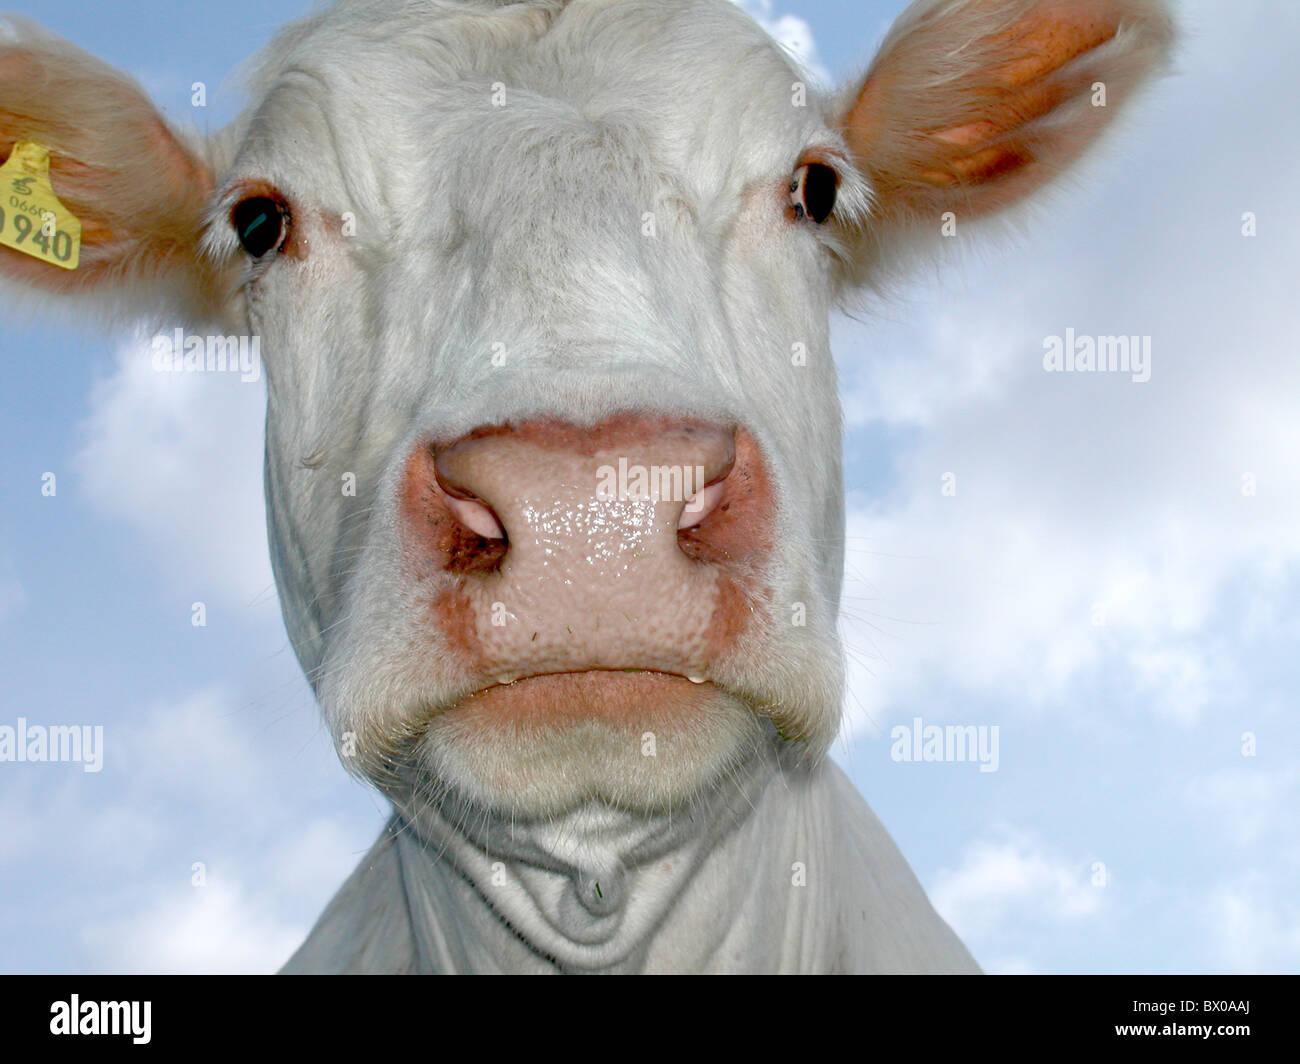 emotion joy happily cheerfully feeling emotion good weather good weather sky head cow amusing nose natu - Stock Image